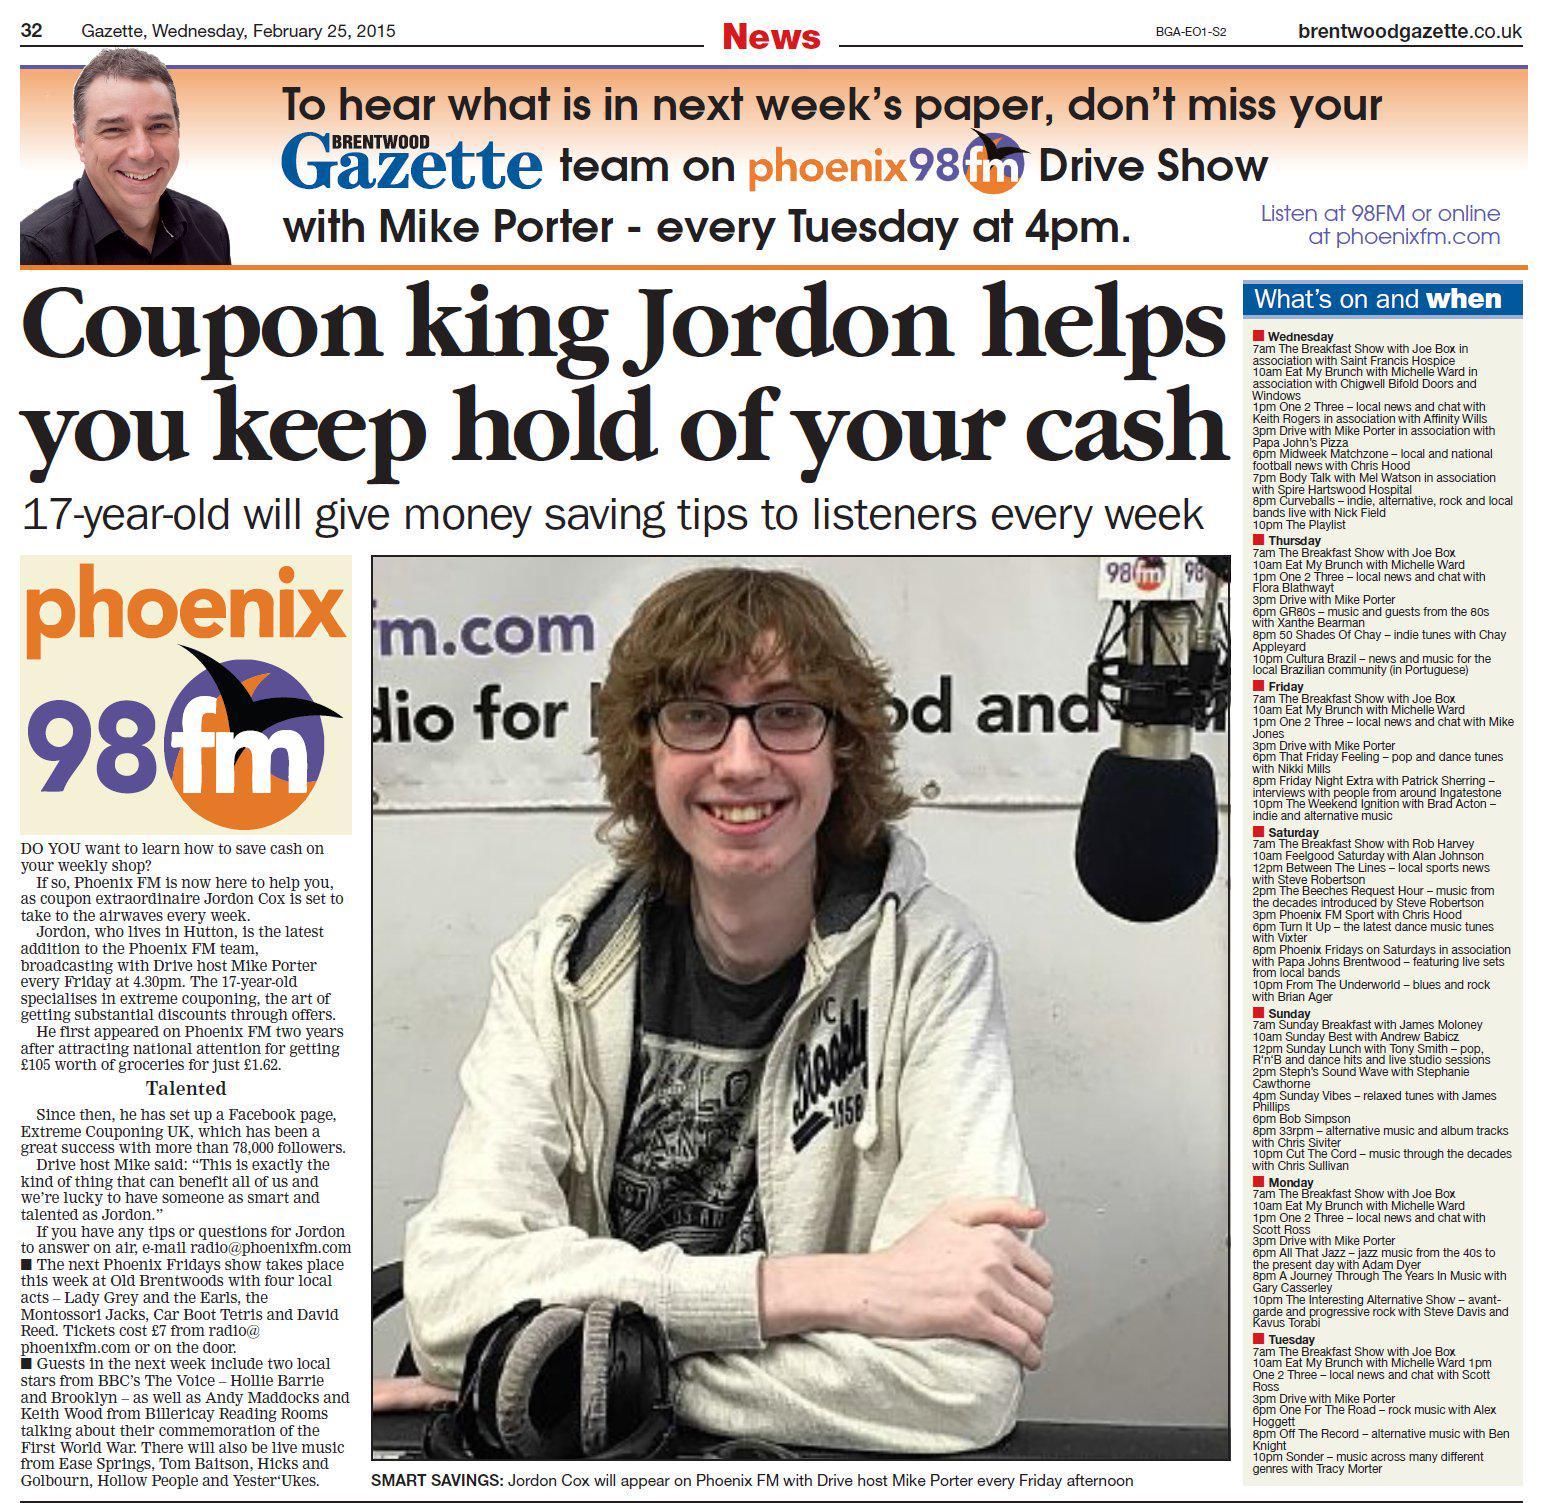 Jordan cox coupons website